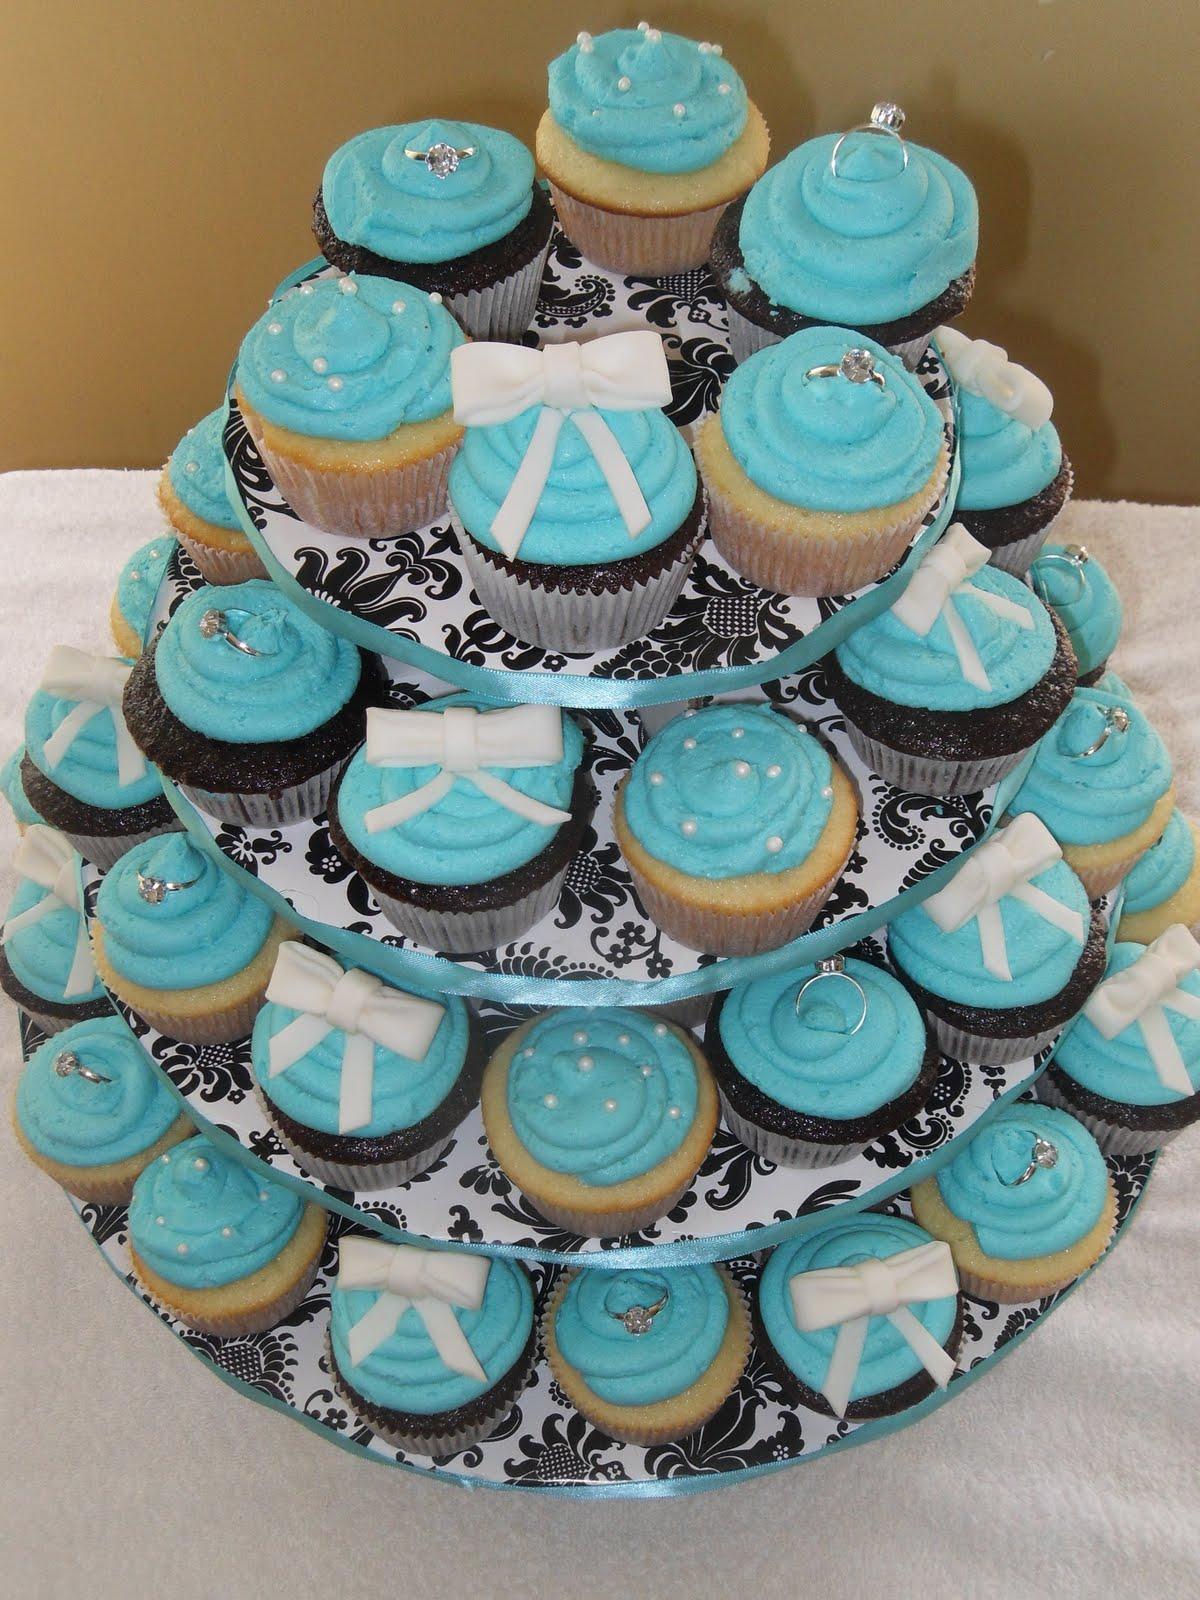 The Sweetest Bridal Shower Cakes   Martha Stewart Weddings  Tiffany Bridal Shower Cakes